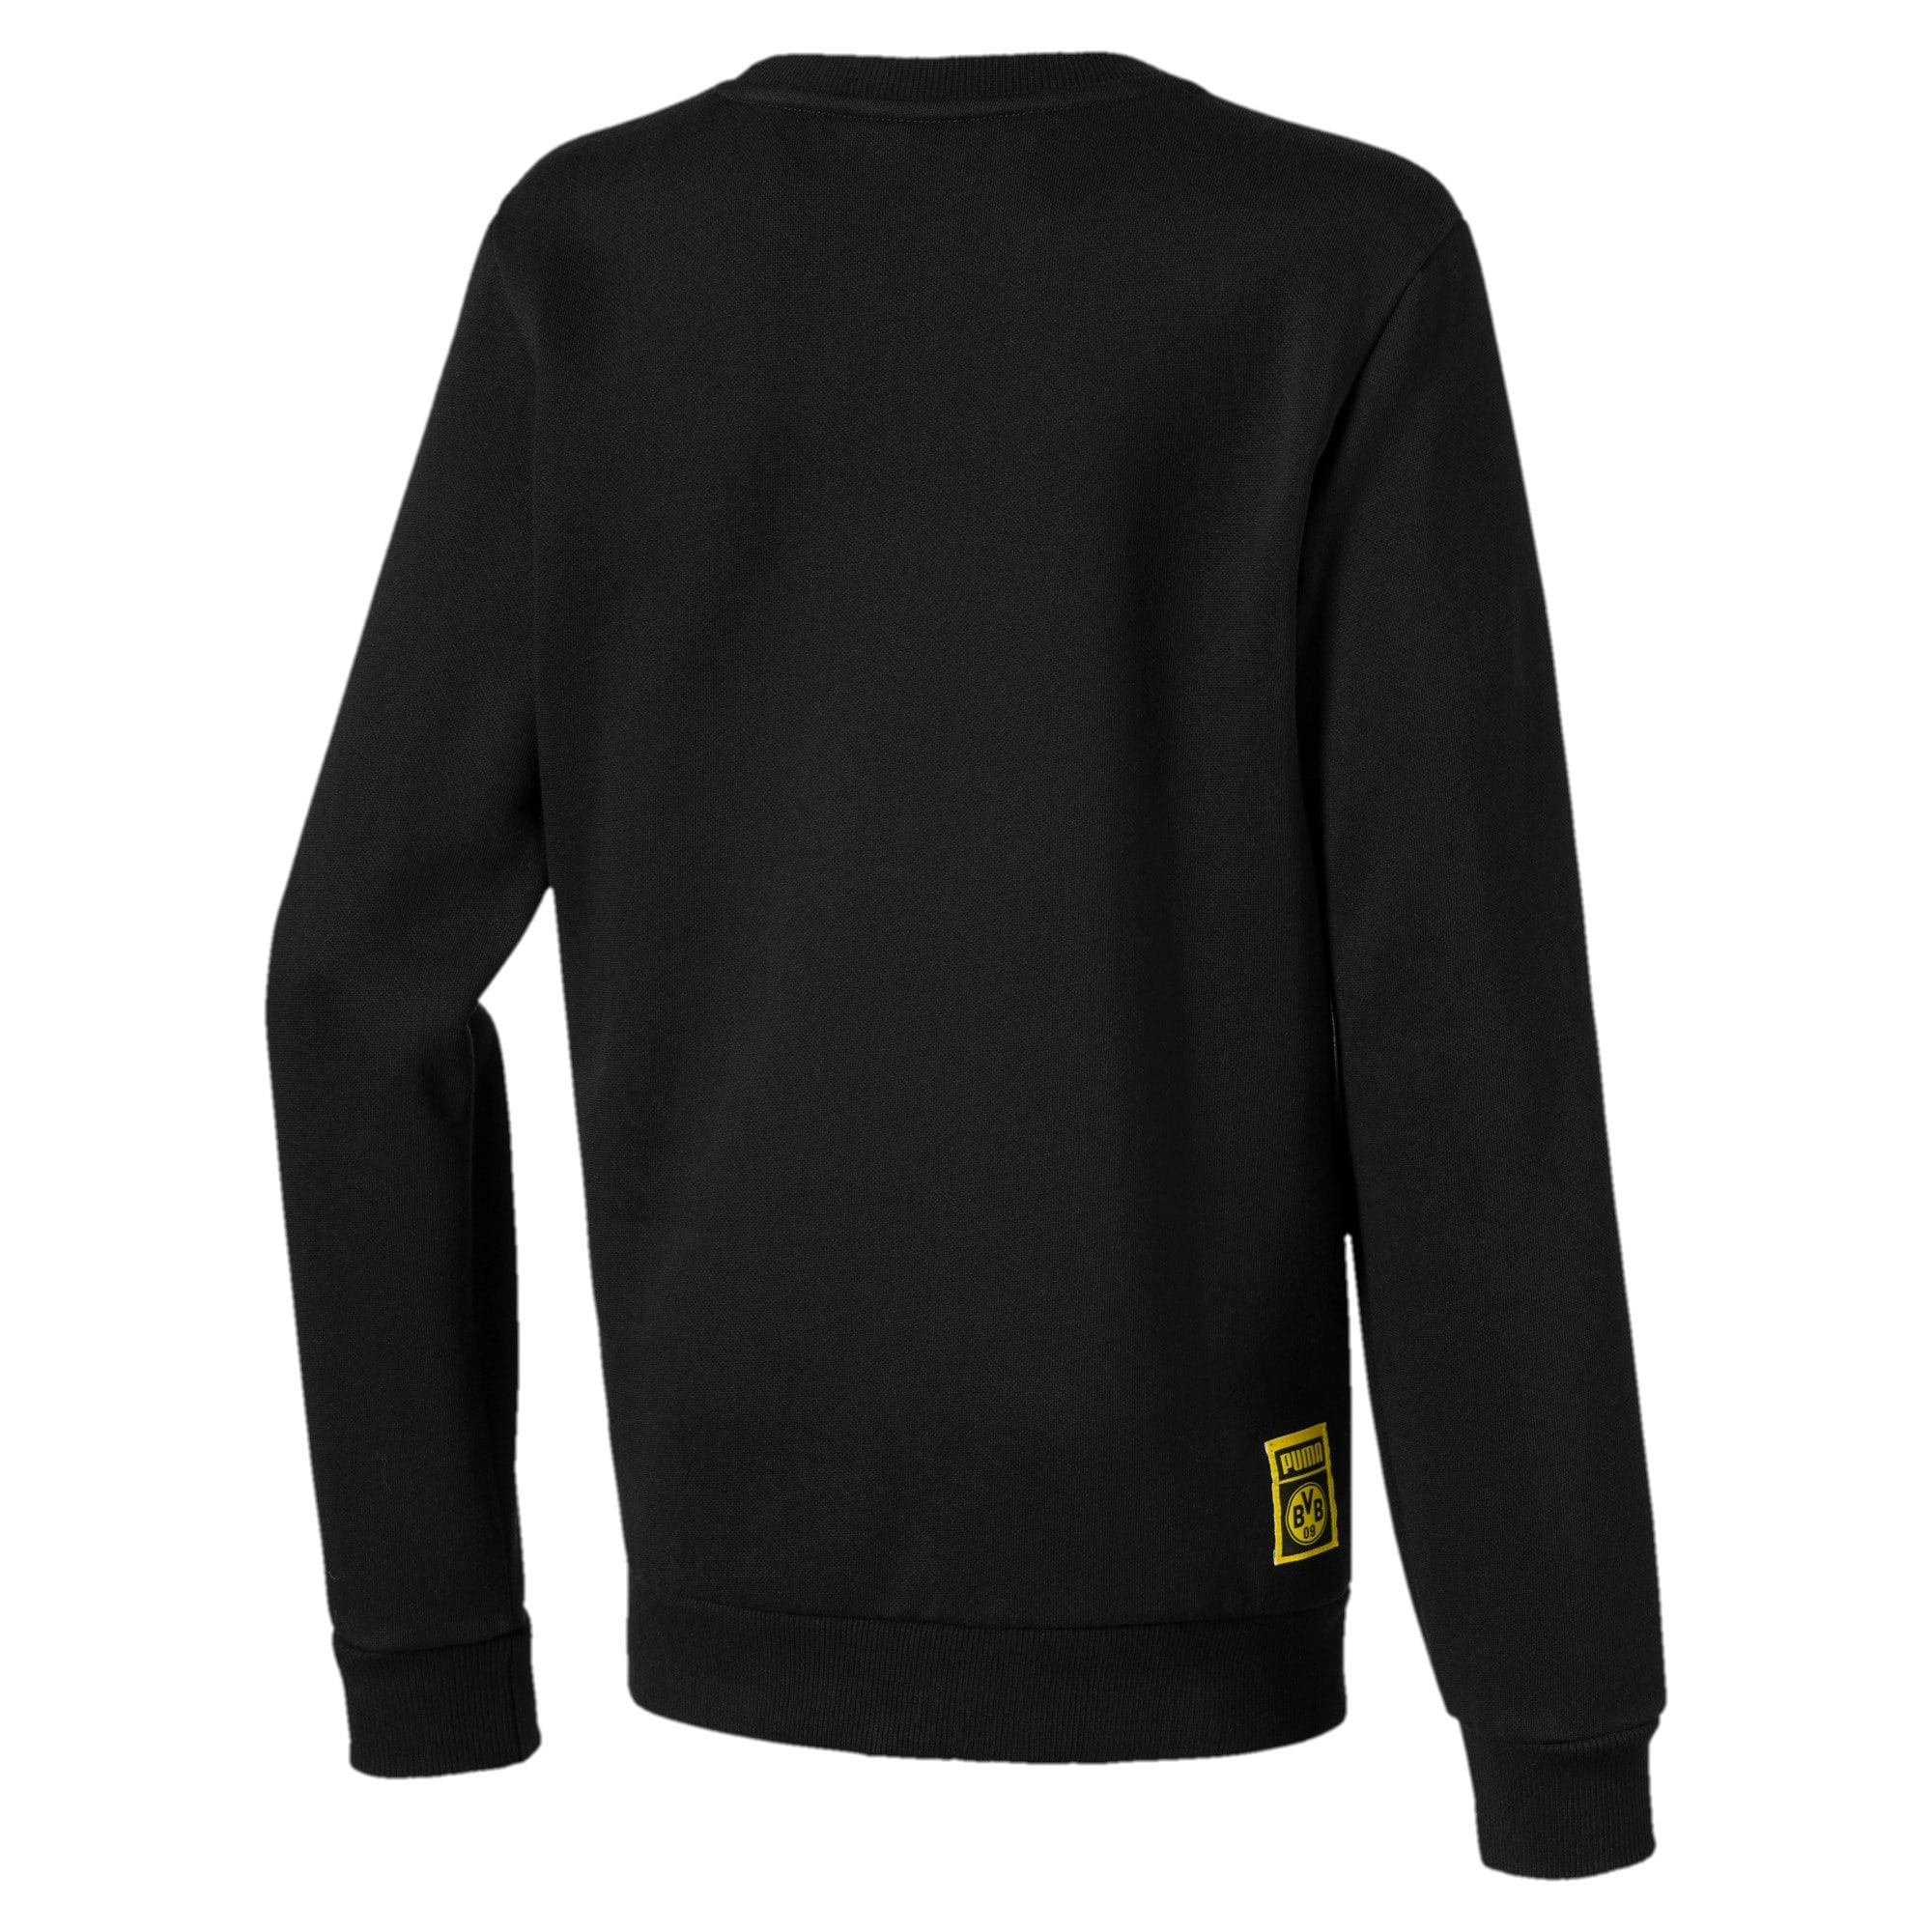 Thumbnail 2 of BVB DNA Kids' Sweater, Puma Black, medium